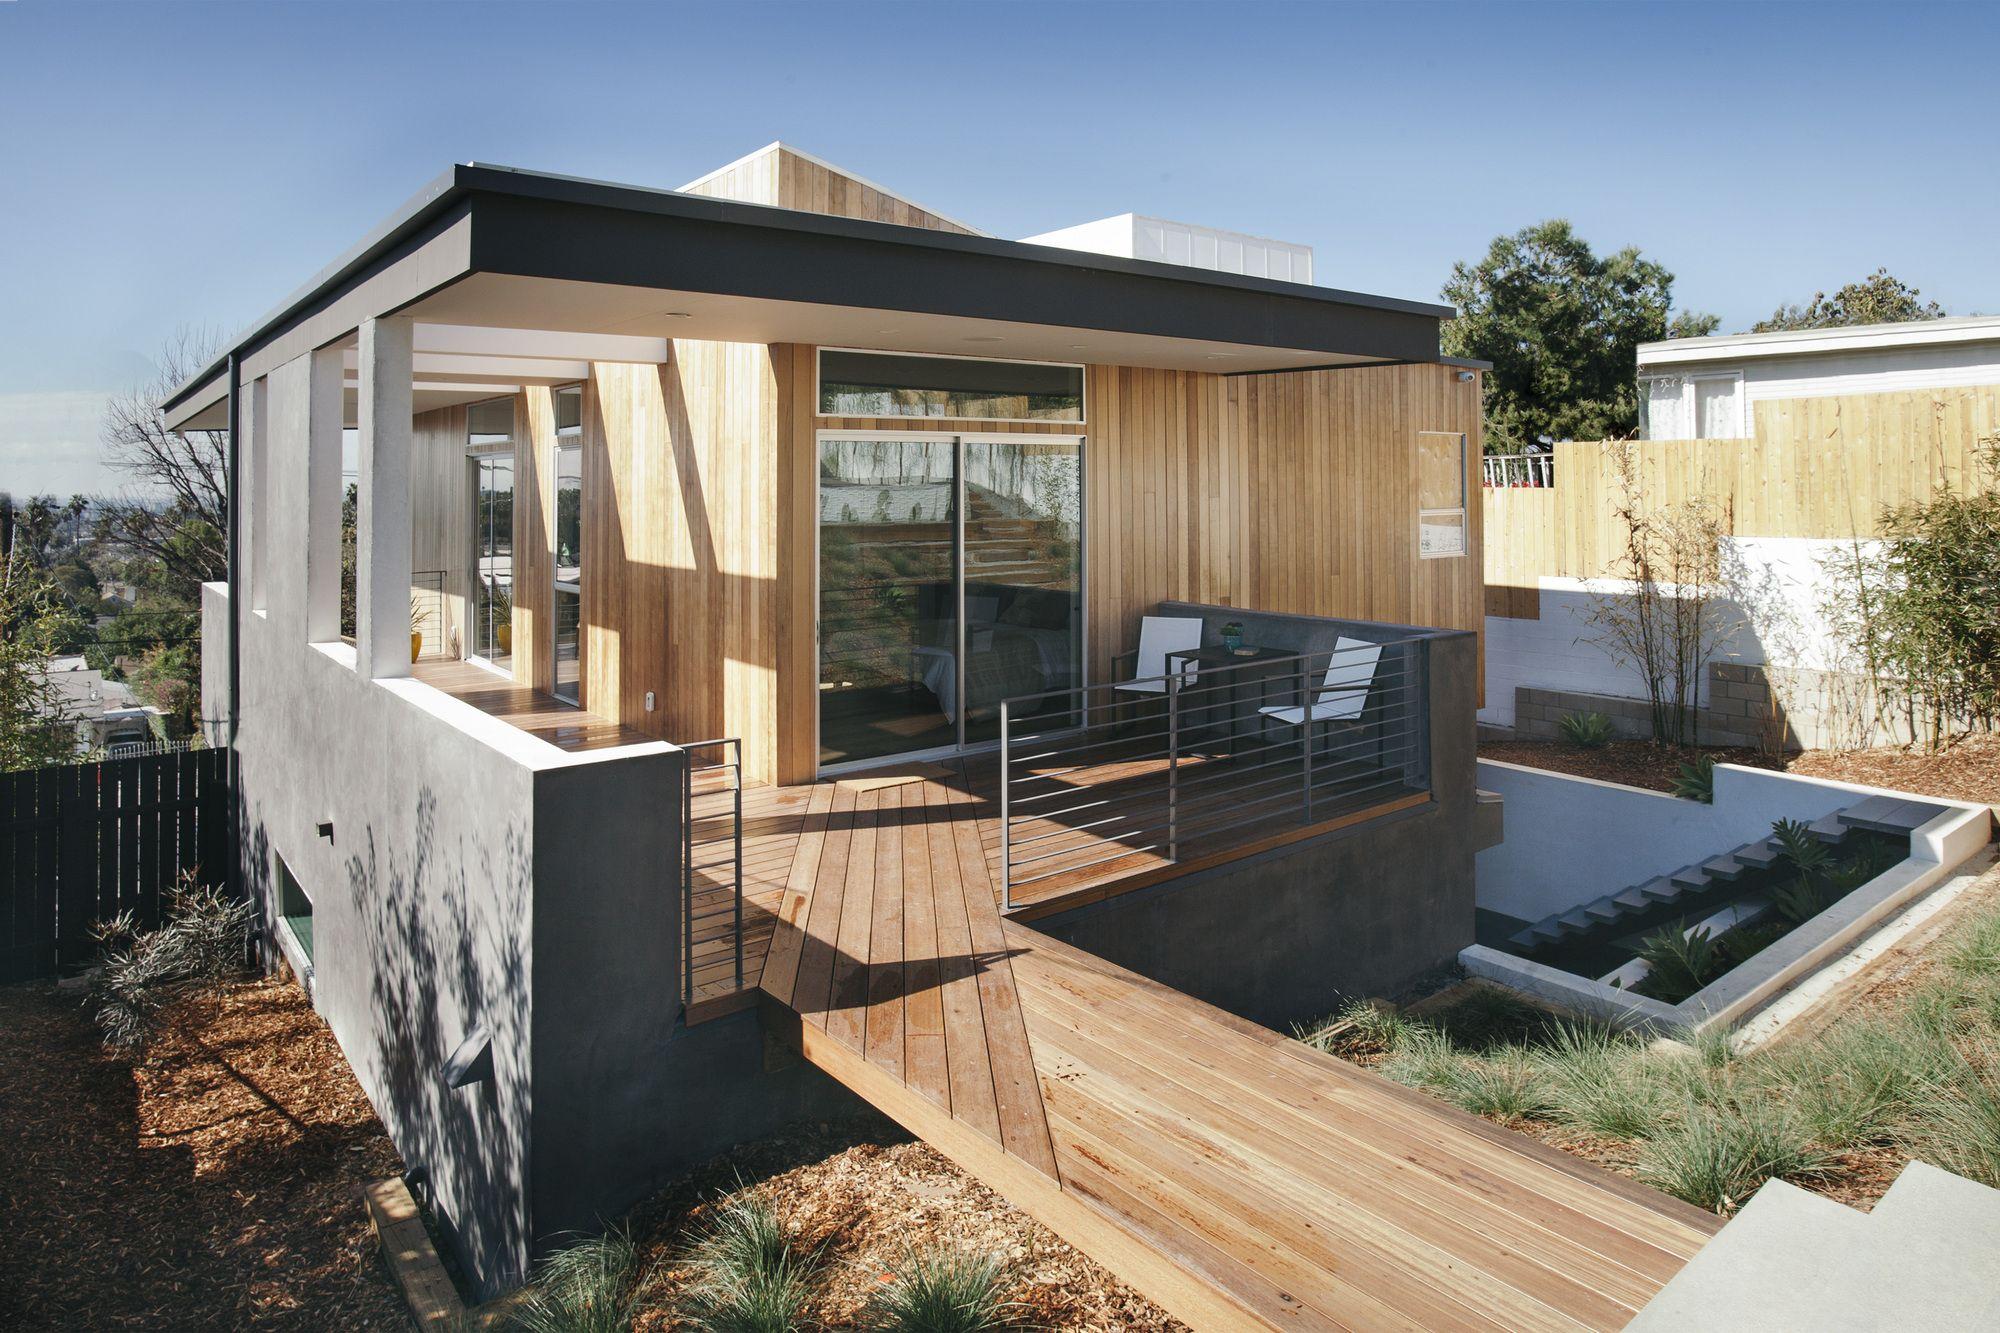 3 Step House Chacol House Built Into Hillside House Built Prefab